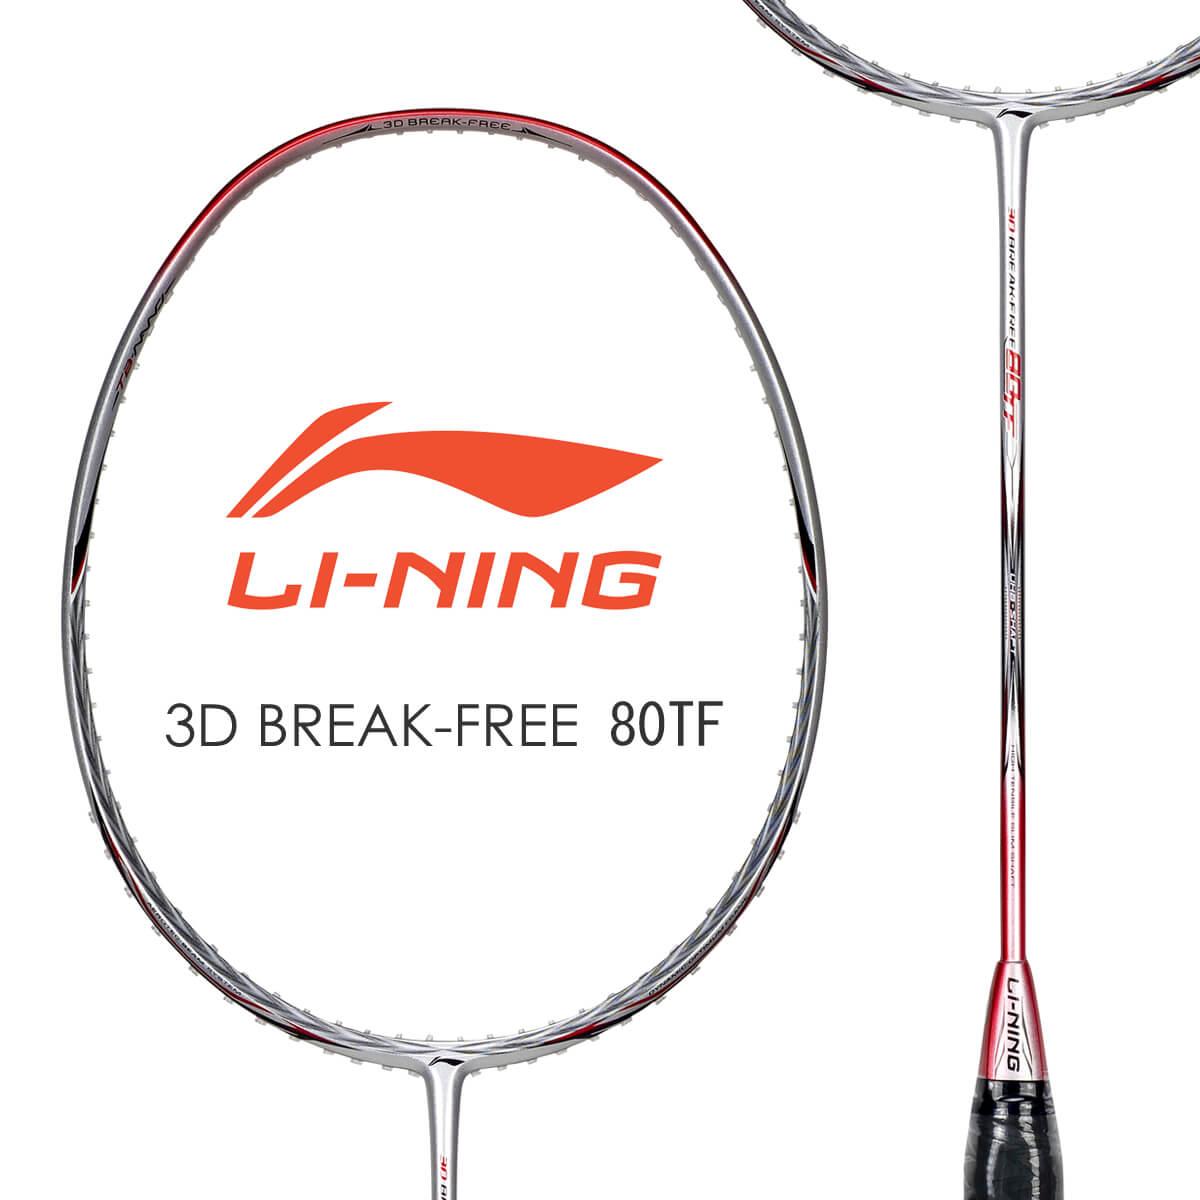 LI-NING 3D BREAK-FREE 80TF(AYPJ008) バドミントンラケット リーニン【オススメガット&ガット張り工賃無料】